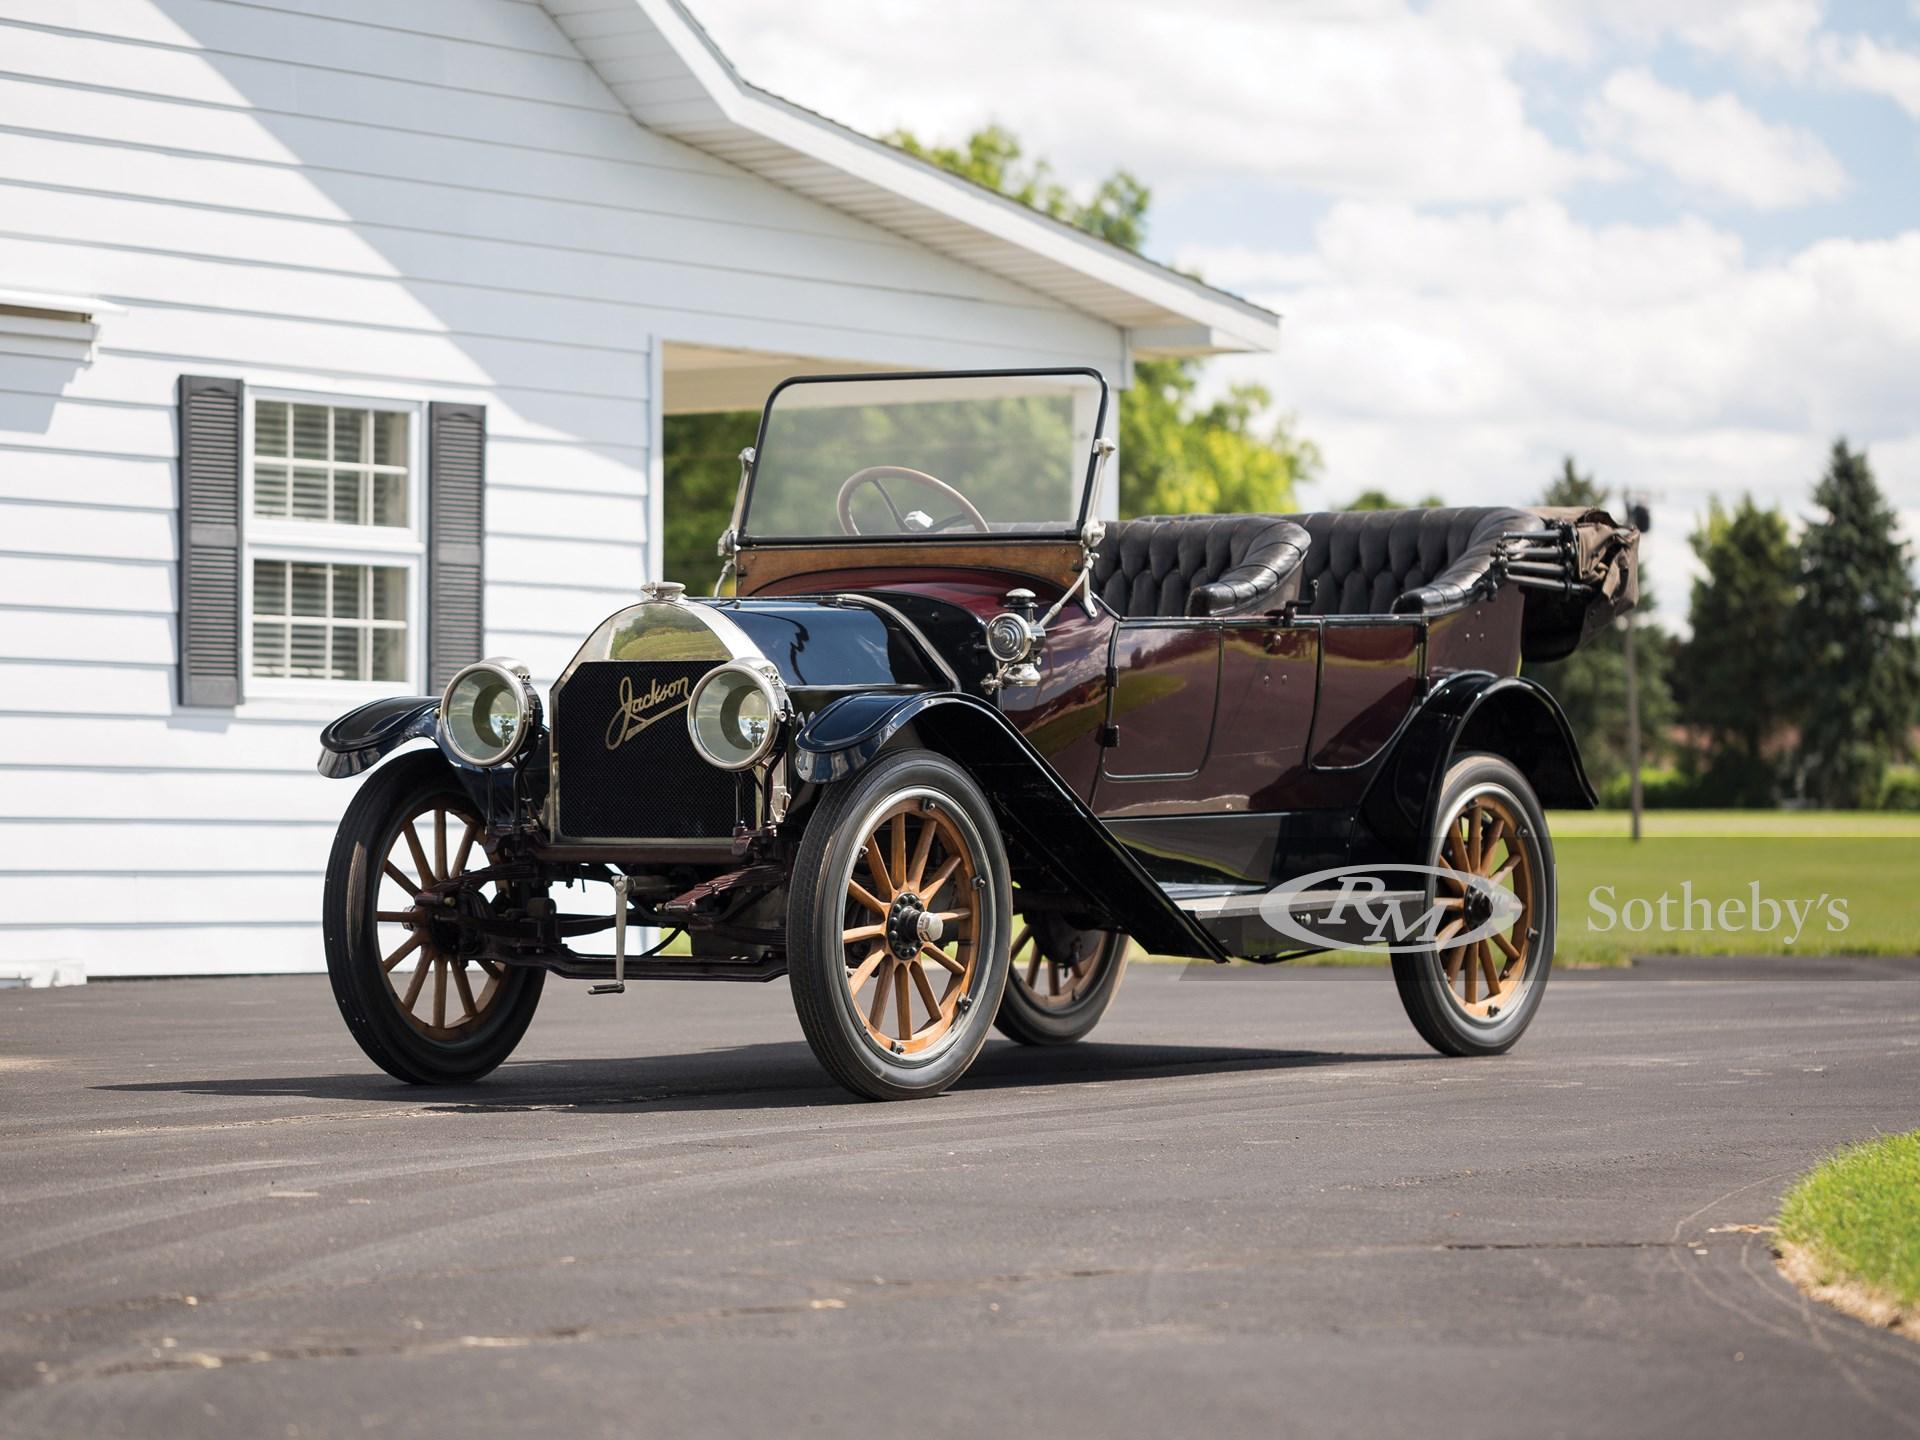 1913 Jackson Sultanic Five-Passenger Touring